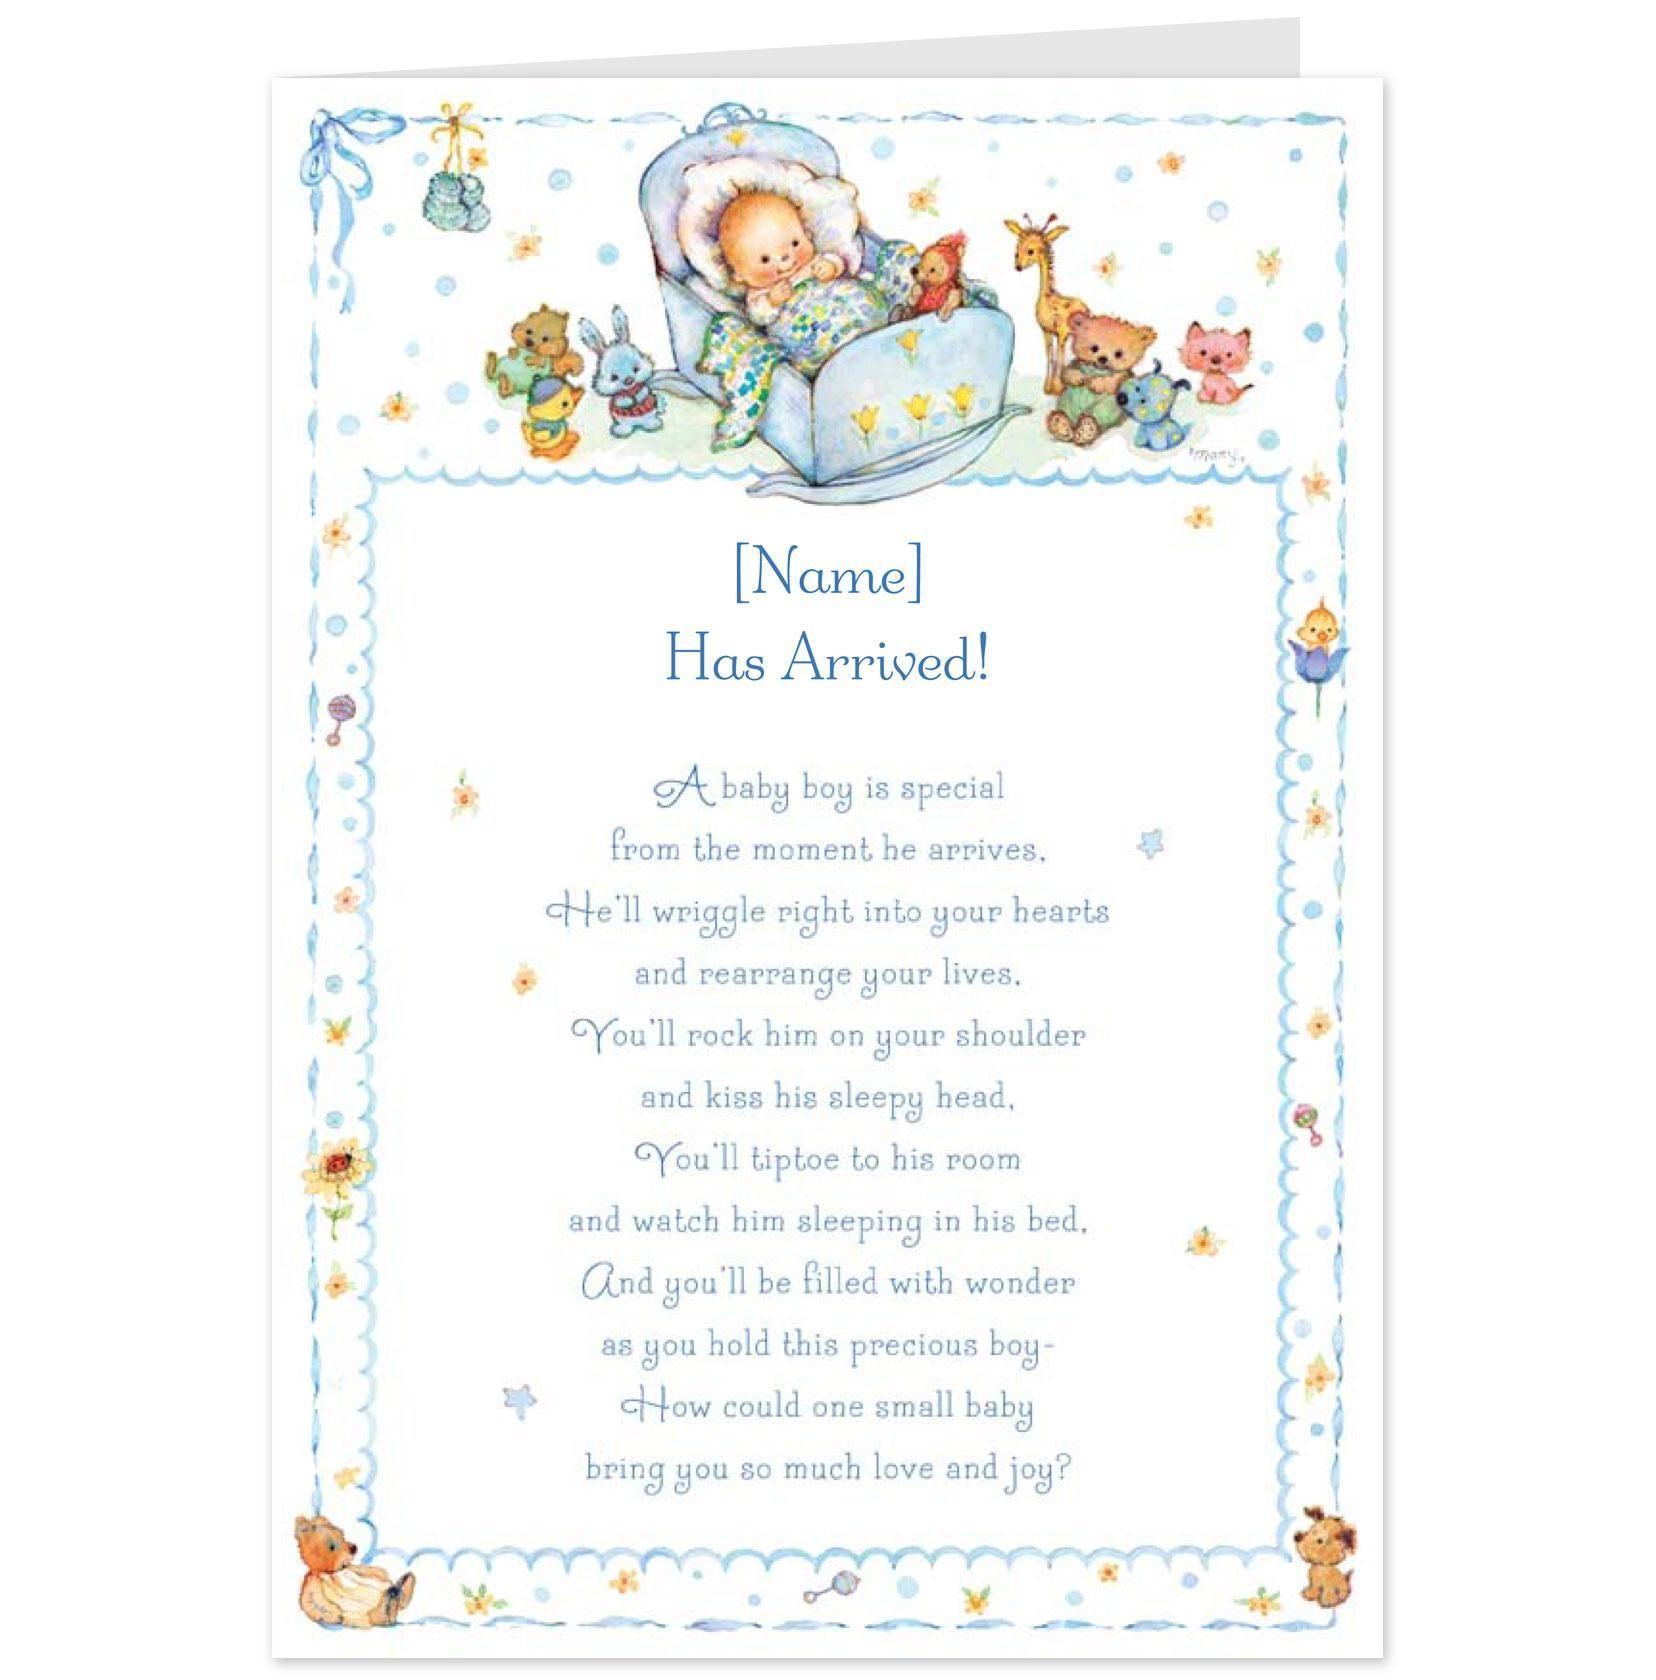 Hallmark Valentines Day Poems Baby Boy Poem Congratulations